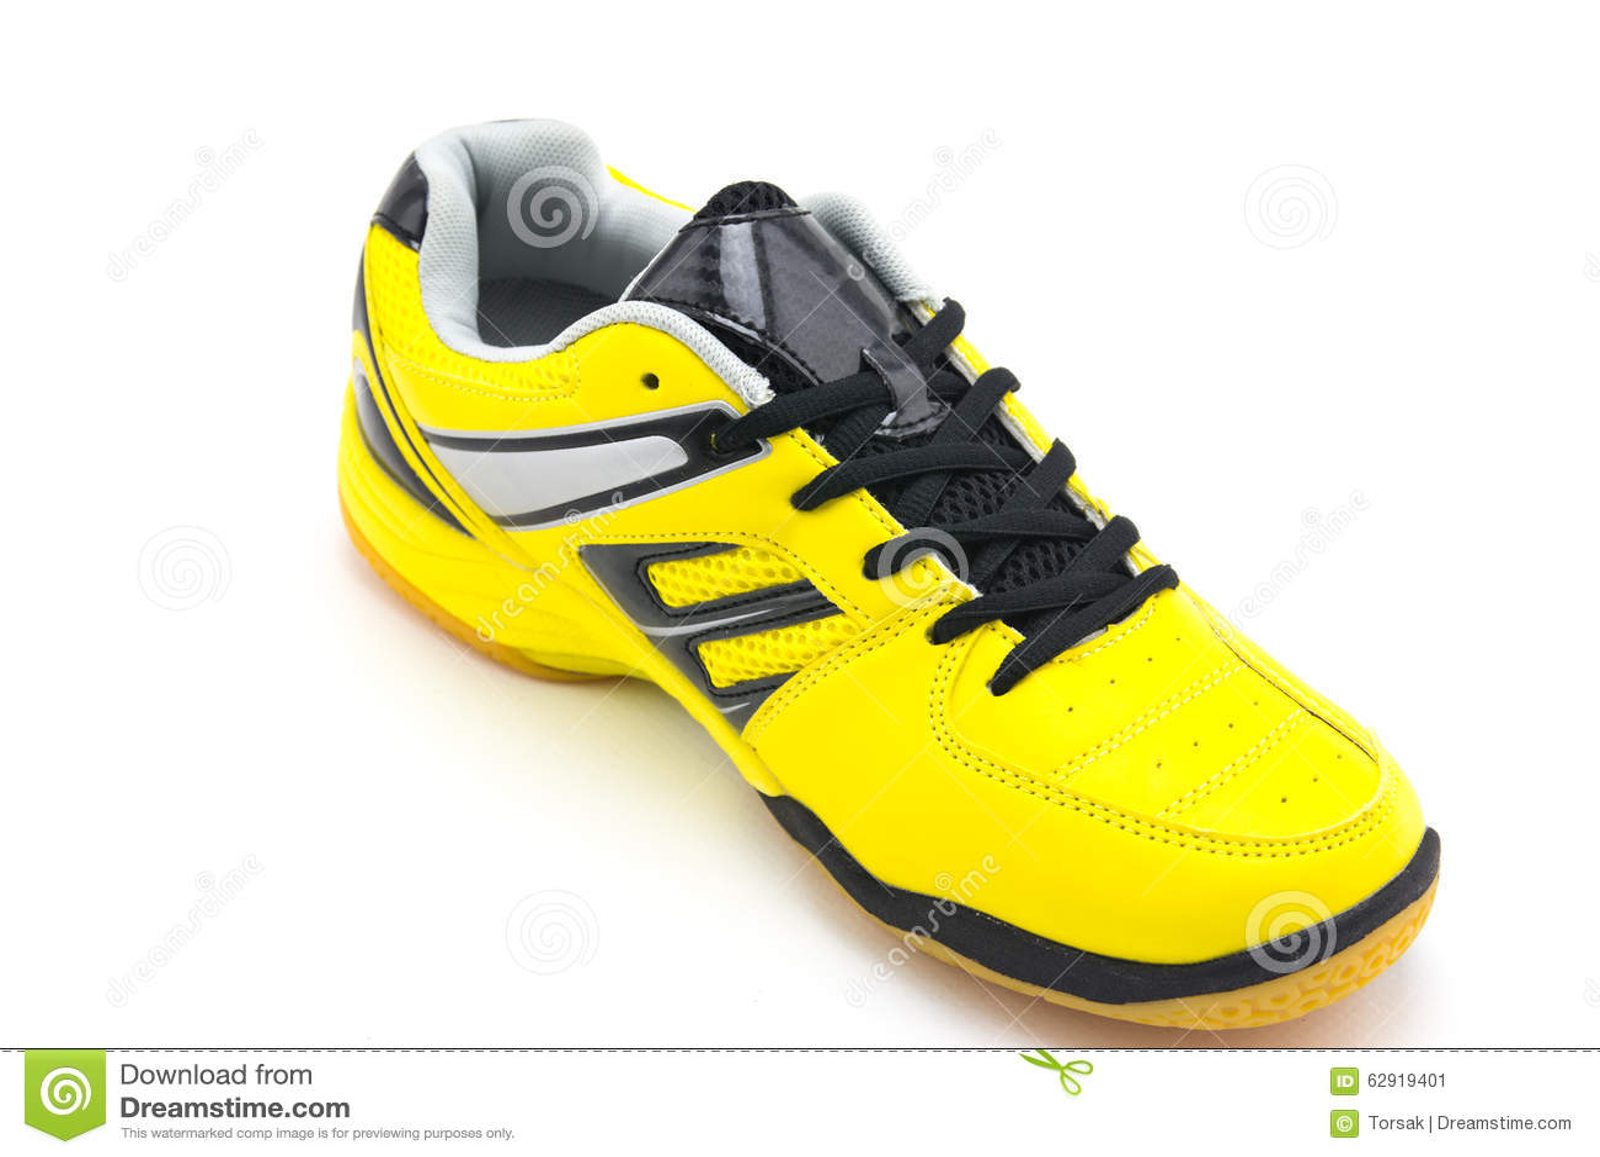 d4b868eb788 Κίτρινα αθλητικά παπούτσια στοκ εικόνα. εικόνα από μόδα - 62919401